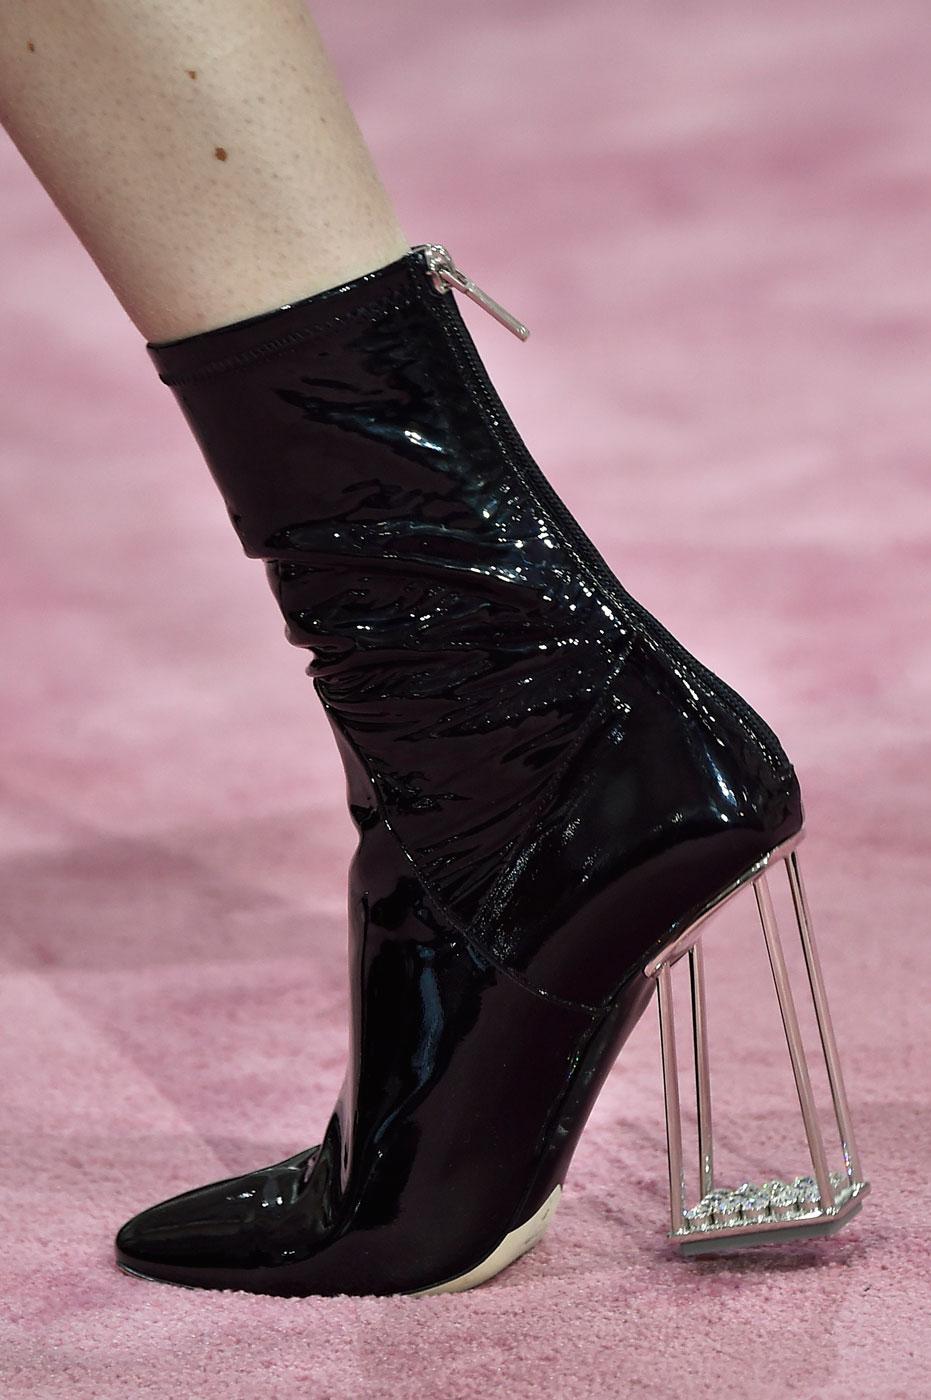 Christian-Dior-fashion-runway-show-close-ups-haute-couture-paris-spring-summer-2015-the-impression-032